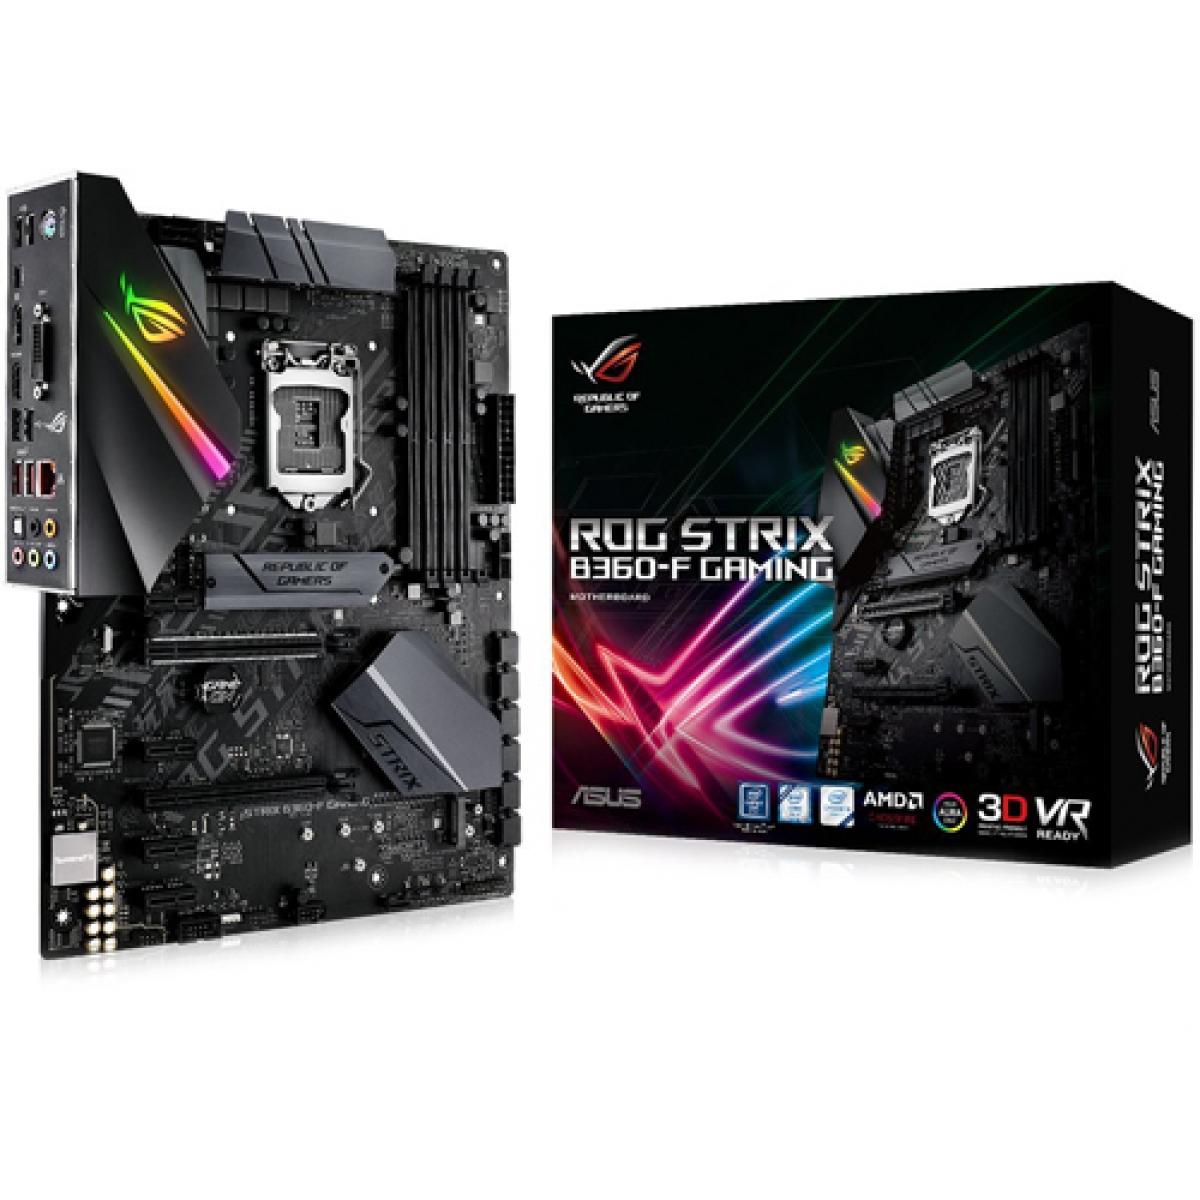 Placa Mãe Asus ROG STRIX B360-F GAMING, Chipset B360, Intel LGA 1151, ATX, DDR4